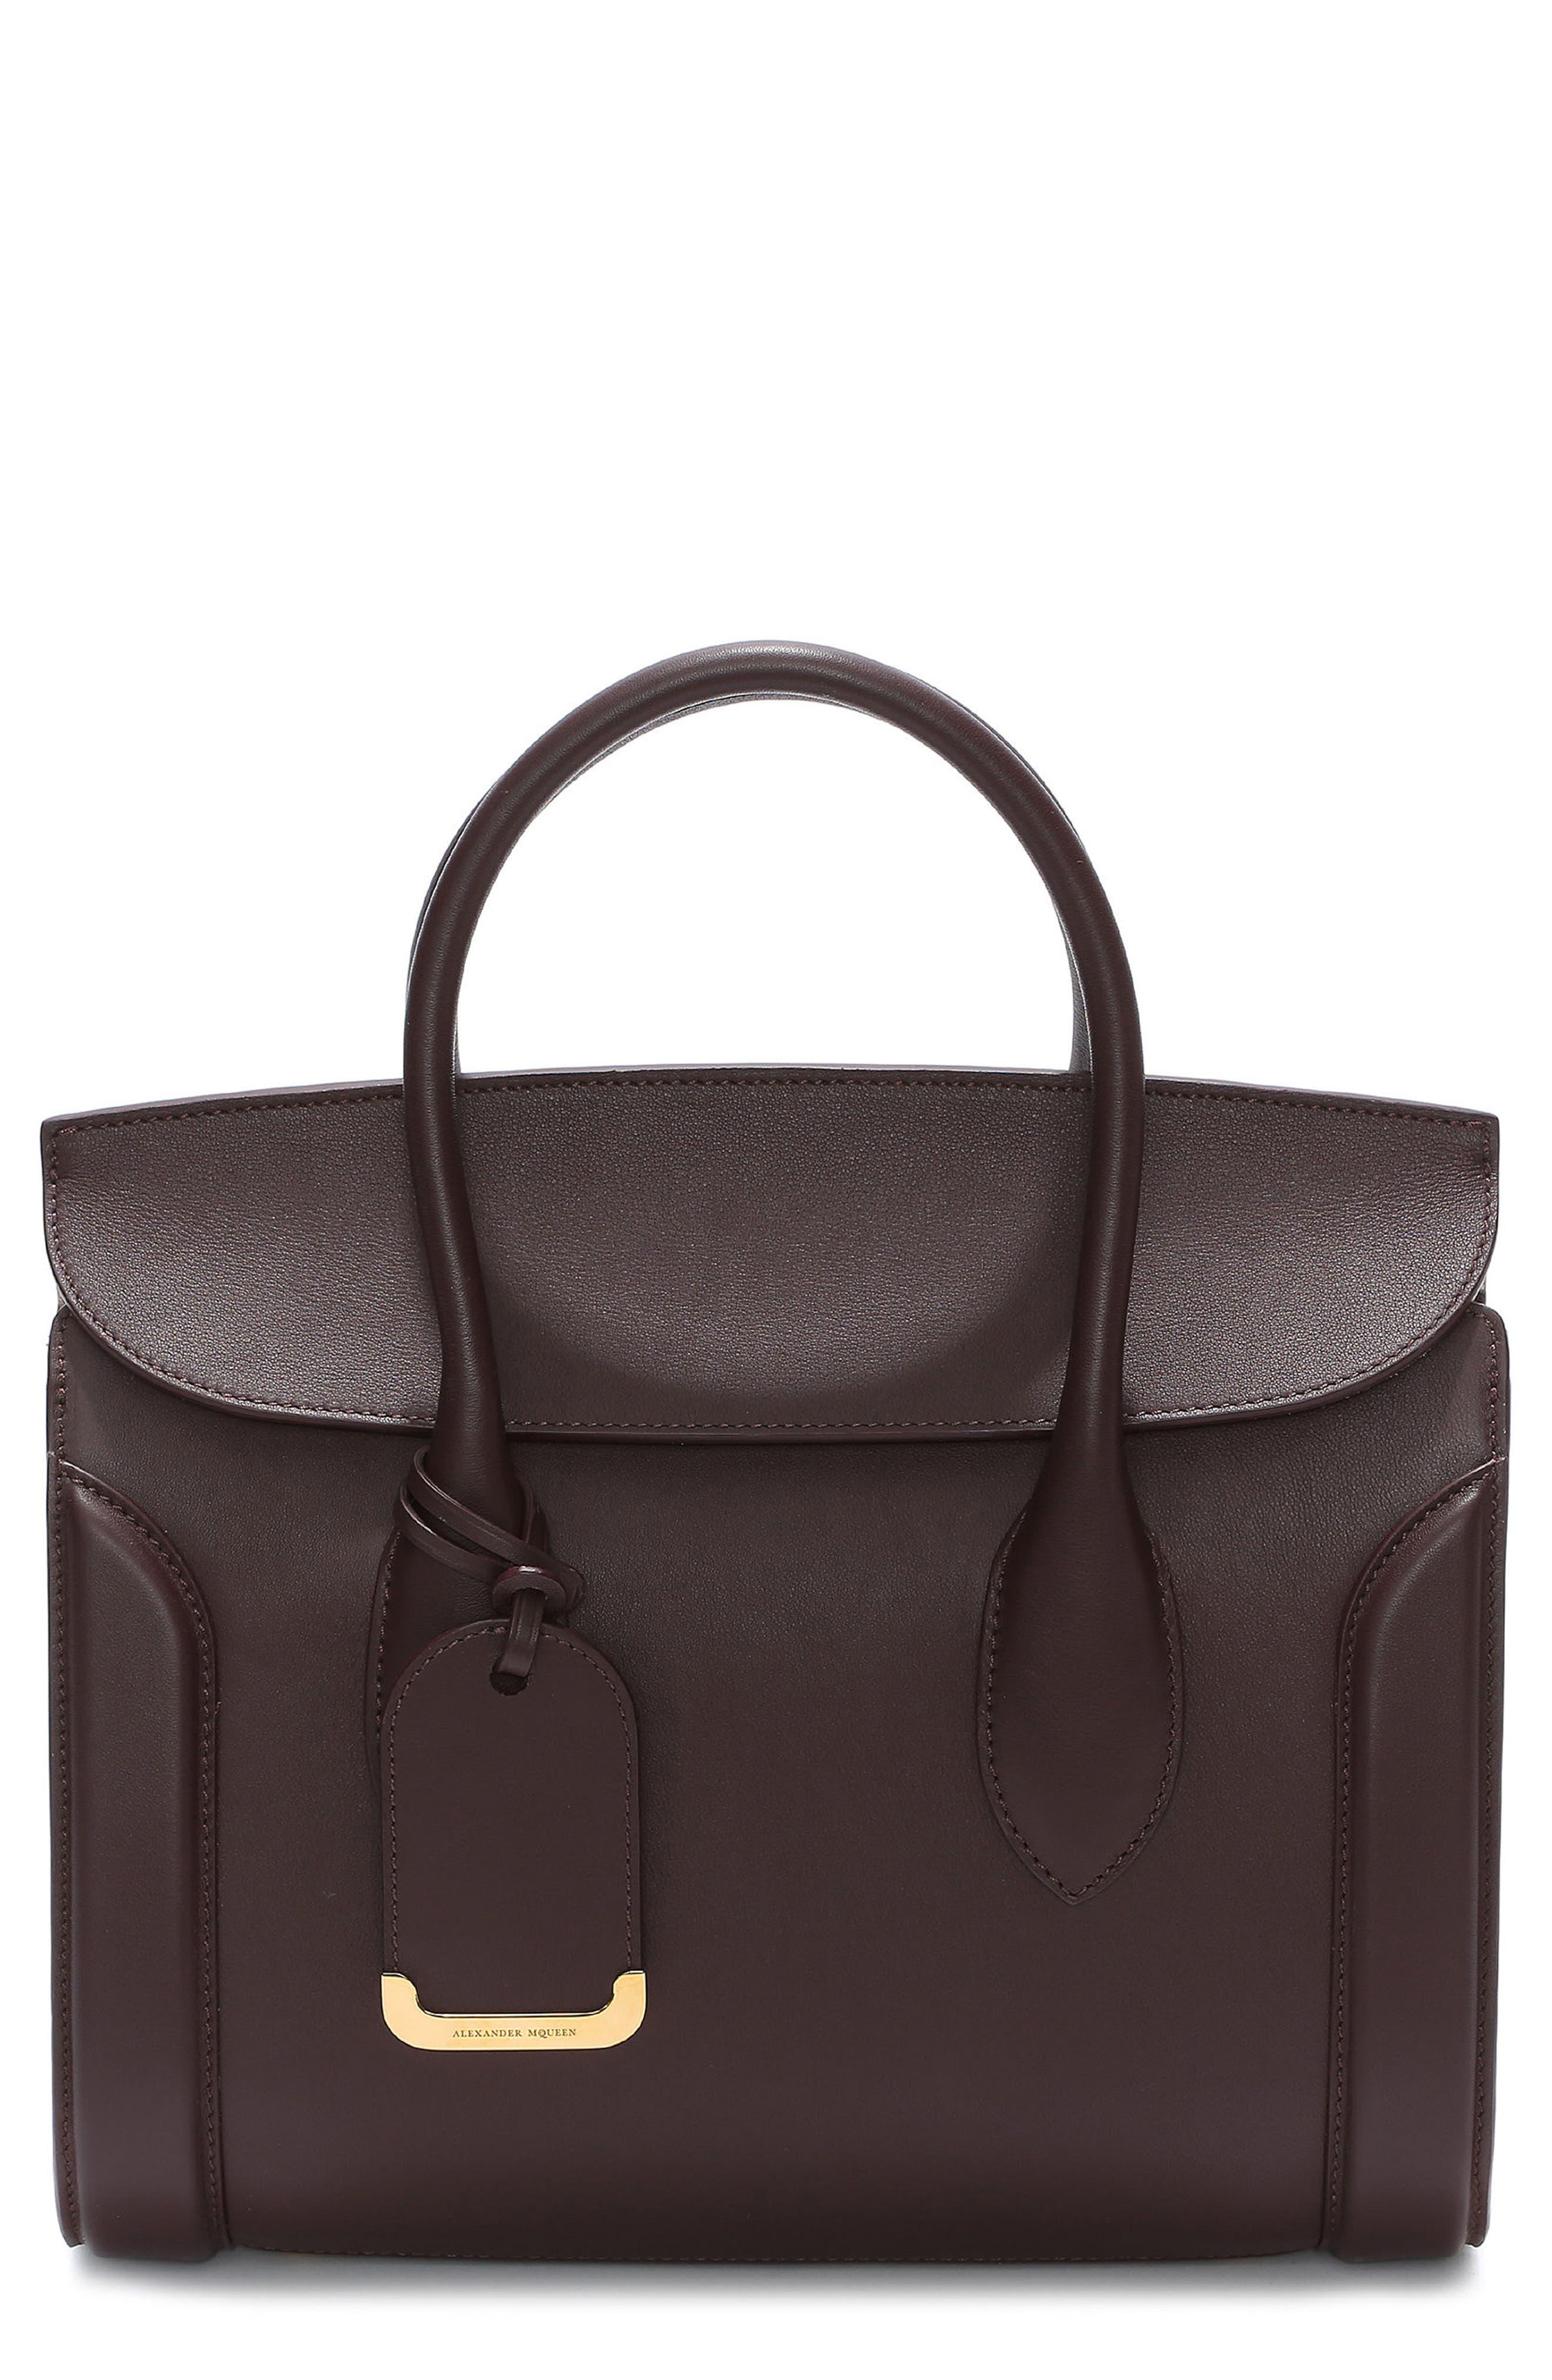 Medium Heroine Calfskin Leather Shopper,                         Main,                         color, BURGUNDY